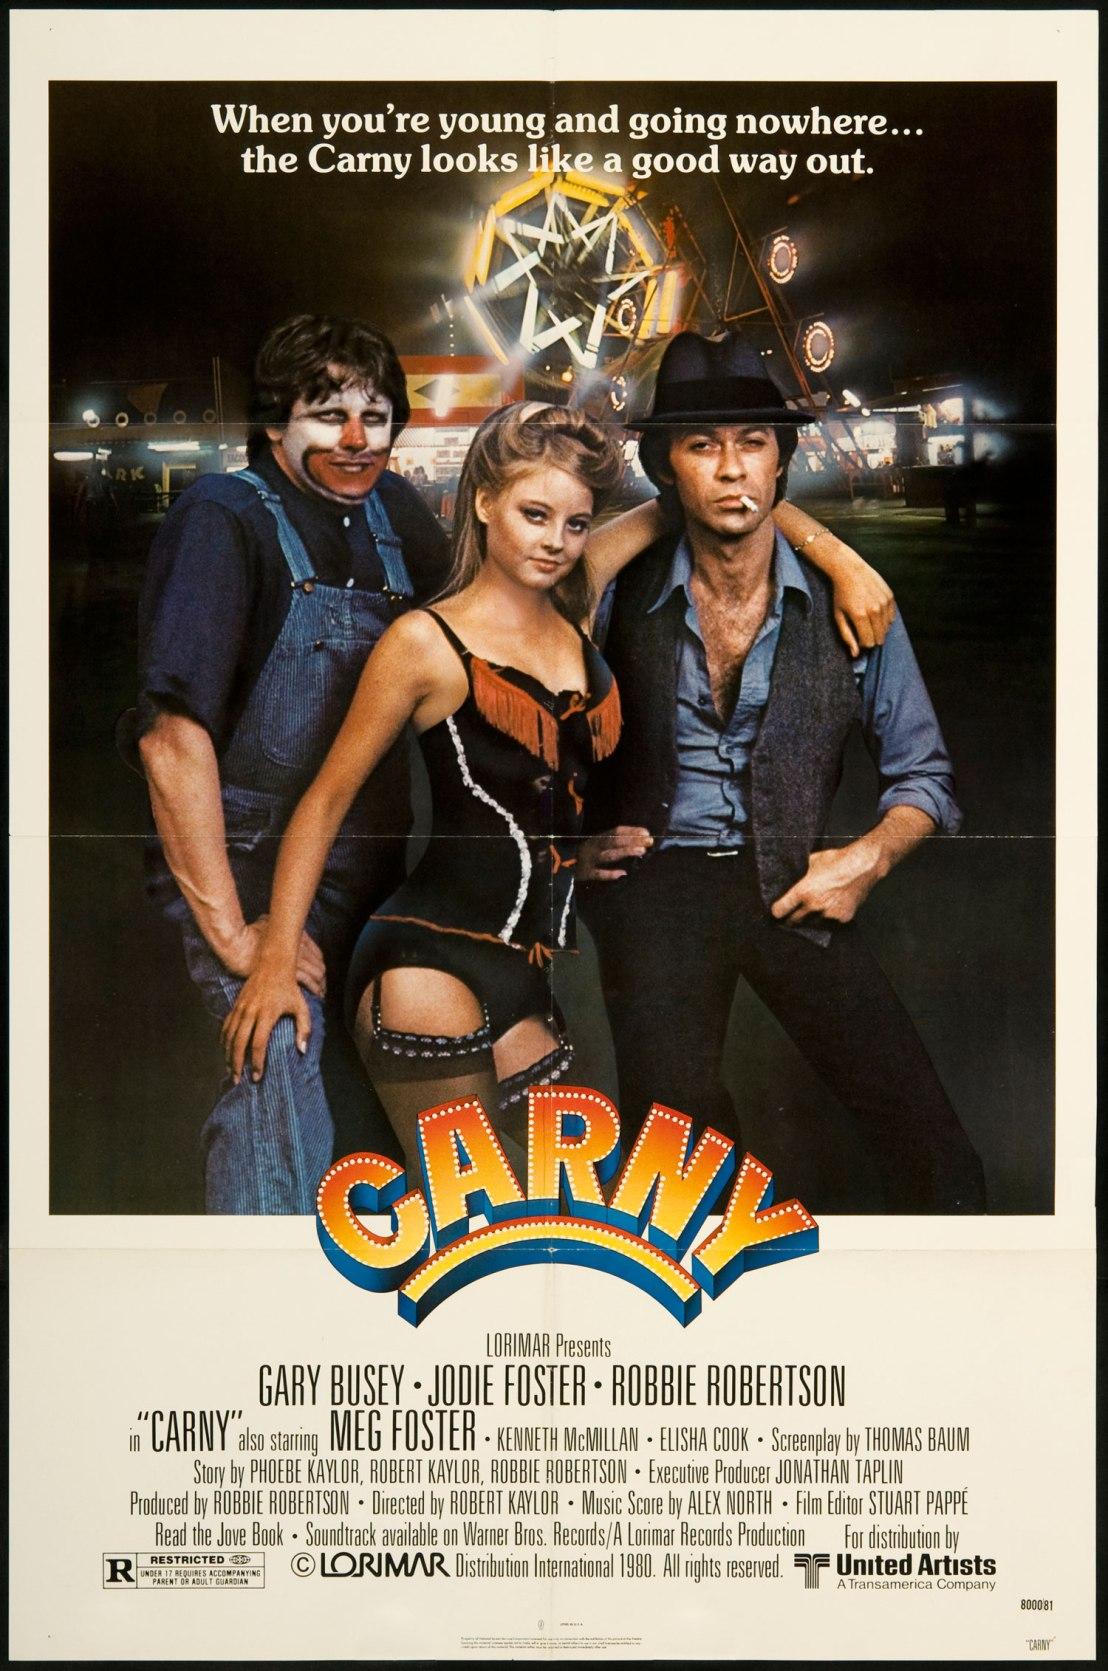 Carny_1980.jpg